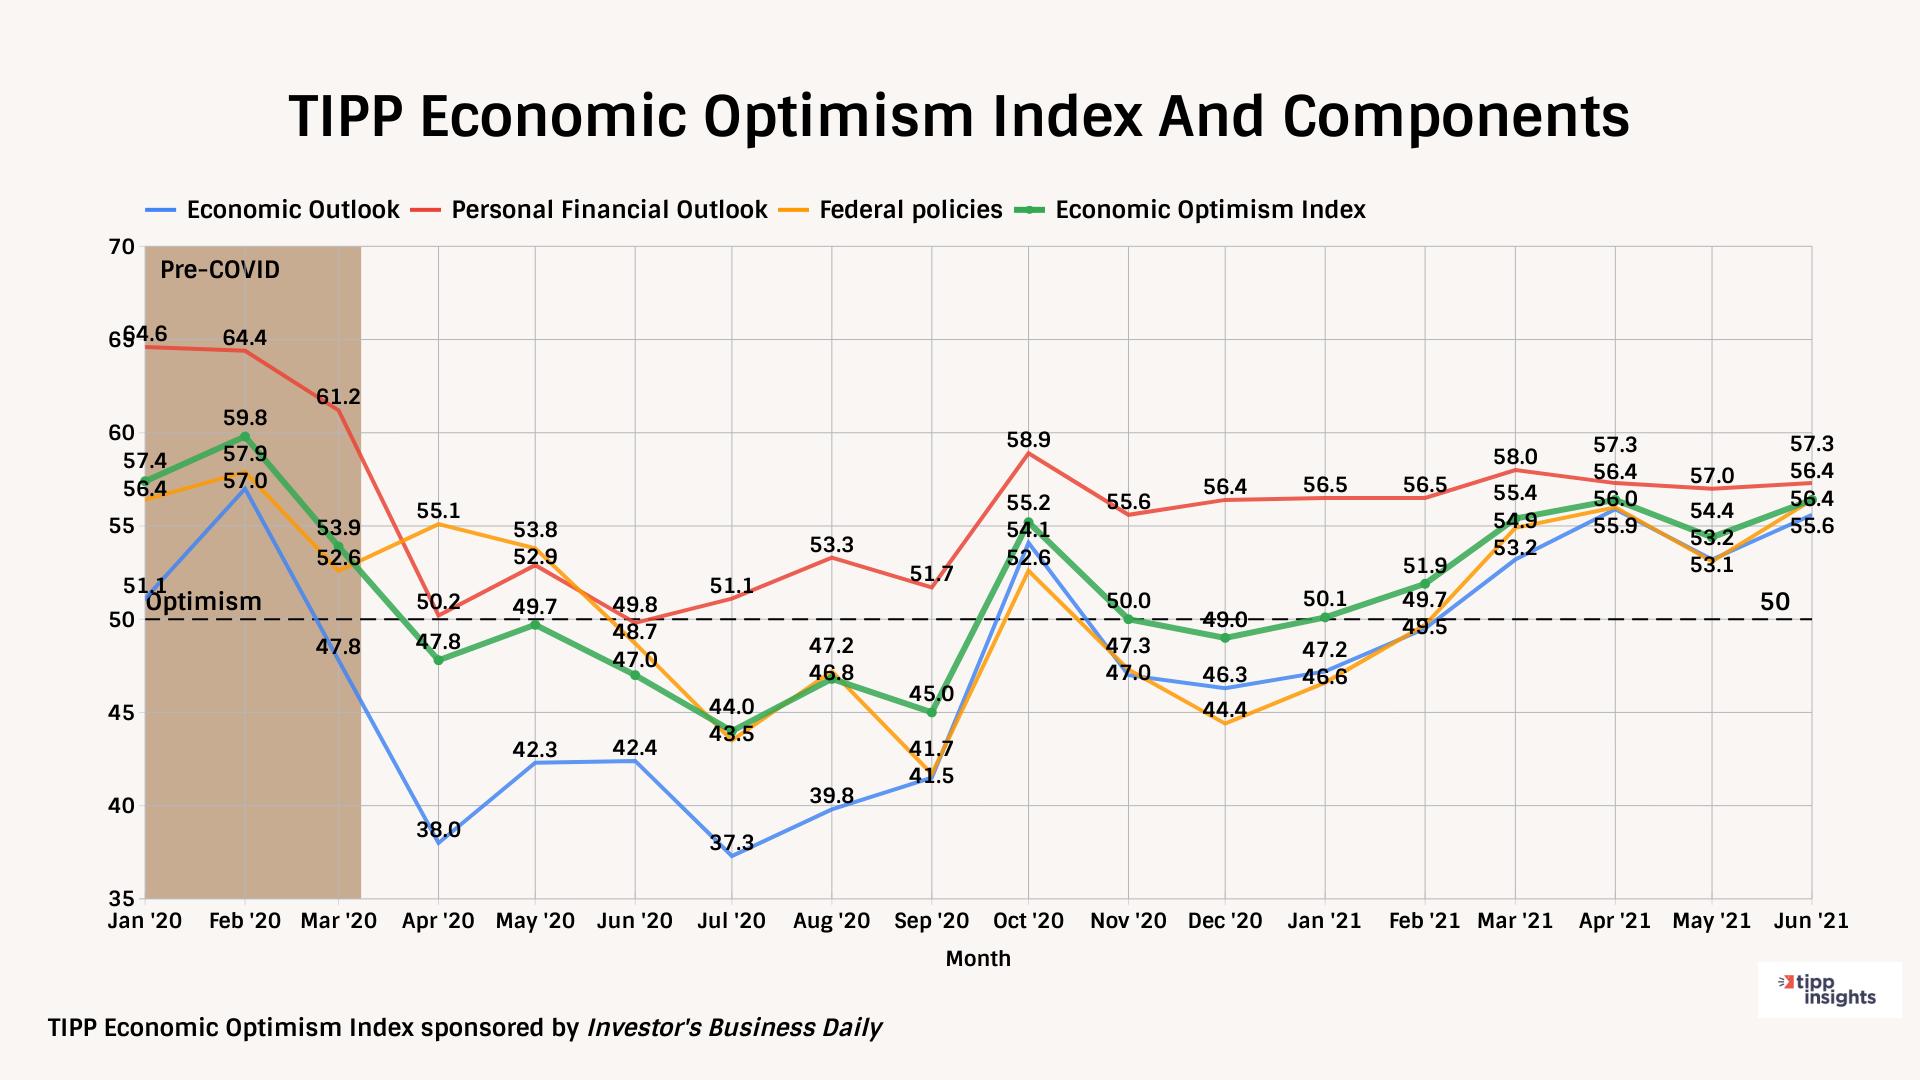 TIPP Poll Economic Optimism Index And Components June 2021